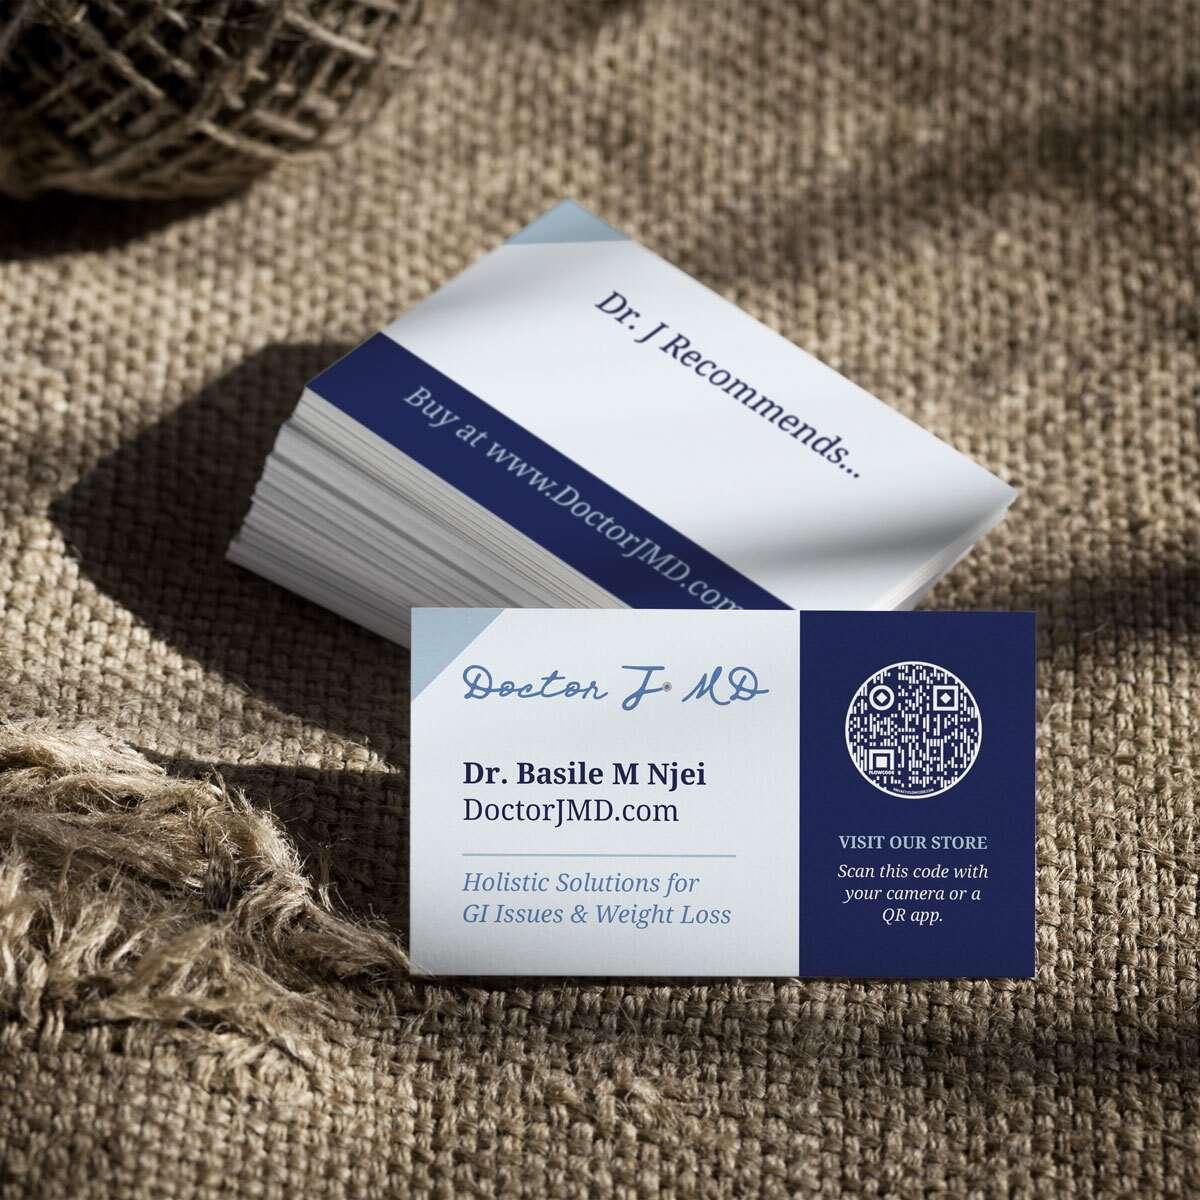 Wellness company business card design from BrandSwan, a Delaware branding agency